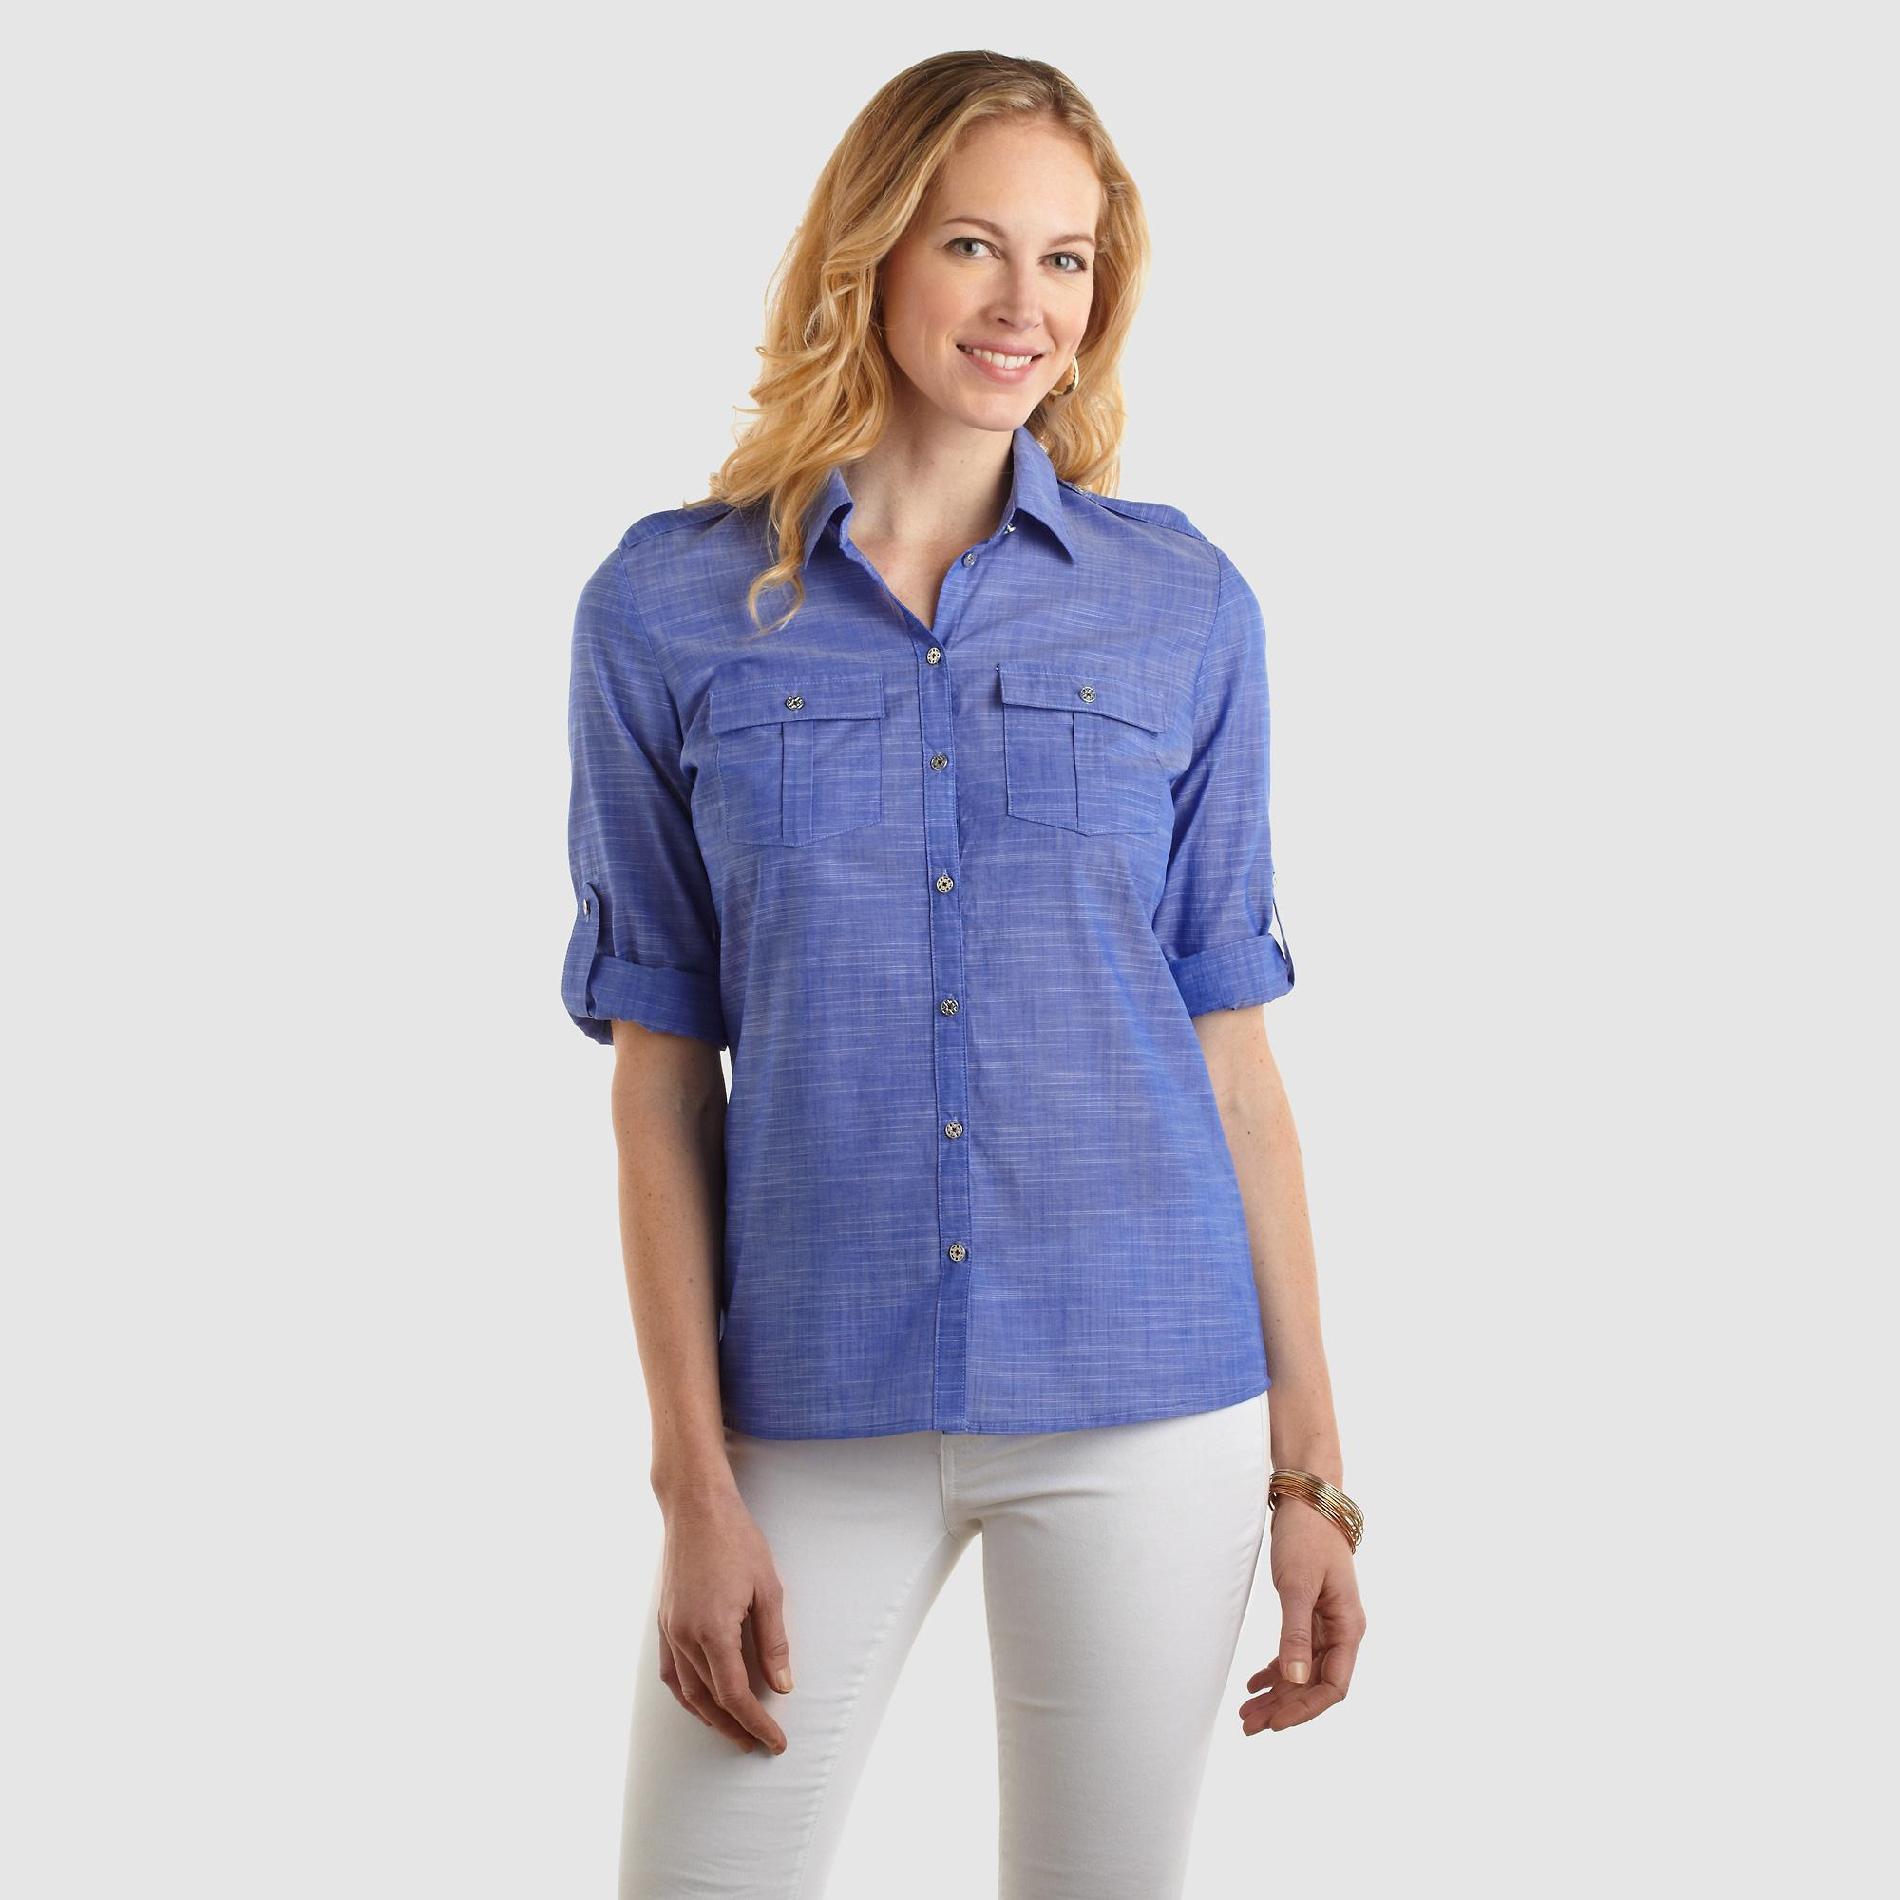 Jaclyn Smith Women's Utility Shirt